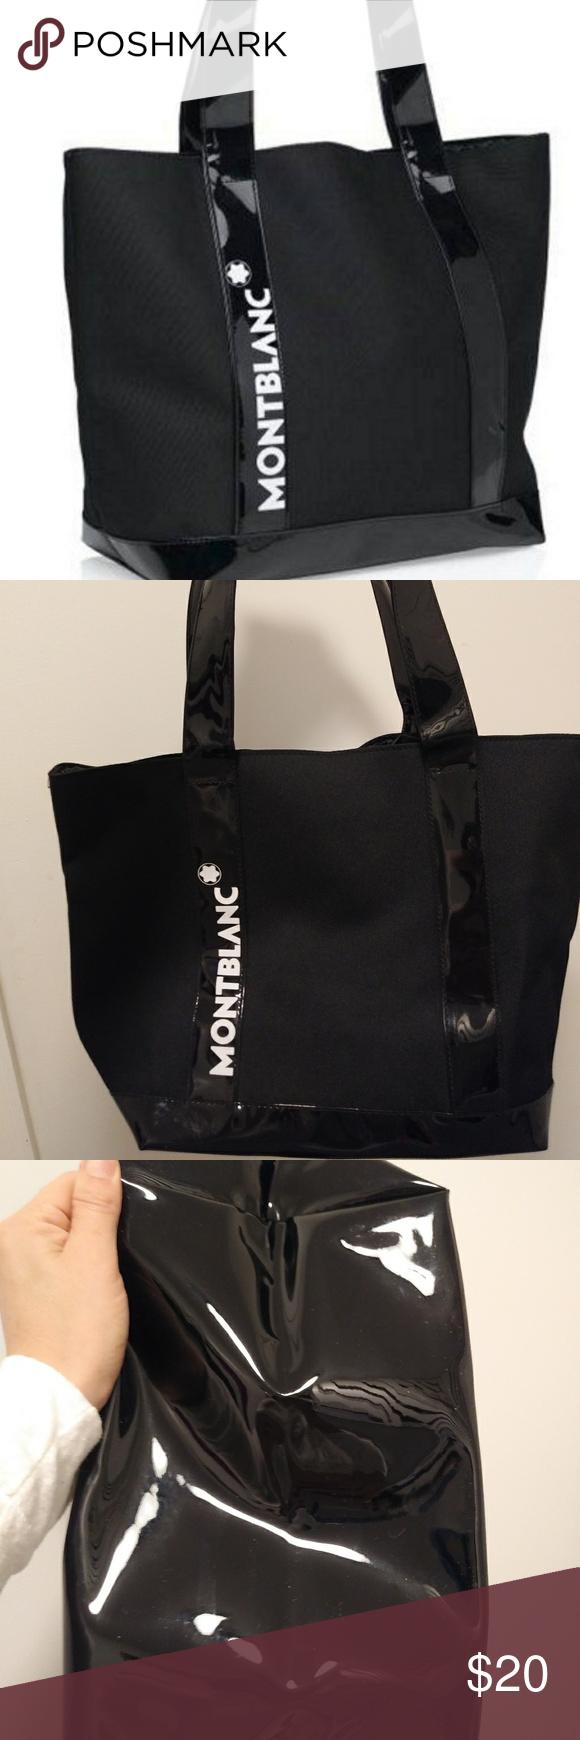 Montblanc Tote Bag Nwot Black Tote Bag Montblanc Bag Bags